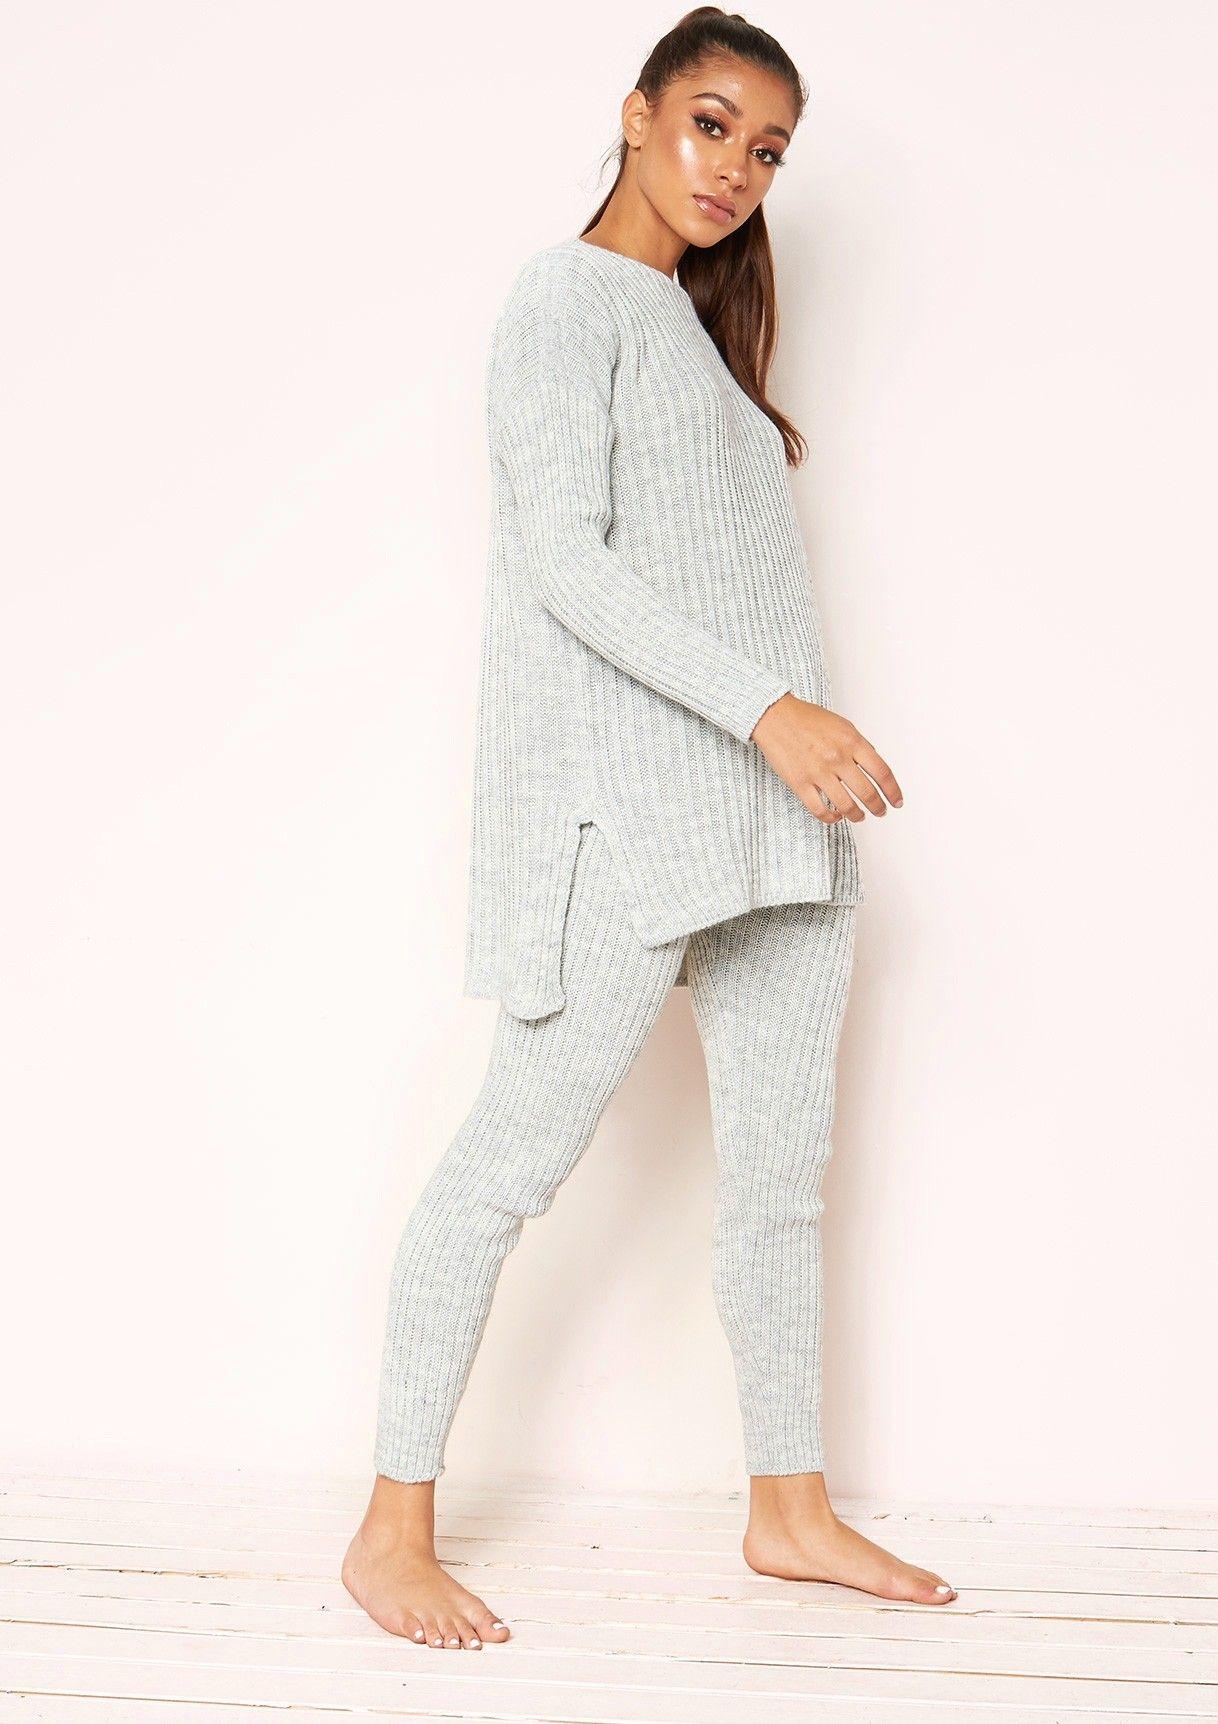 4a84e5f5e4ea Missyempire - Anya Grey Knit Jumper Loungewear Set